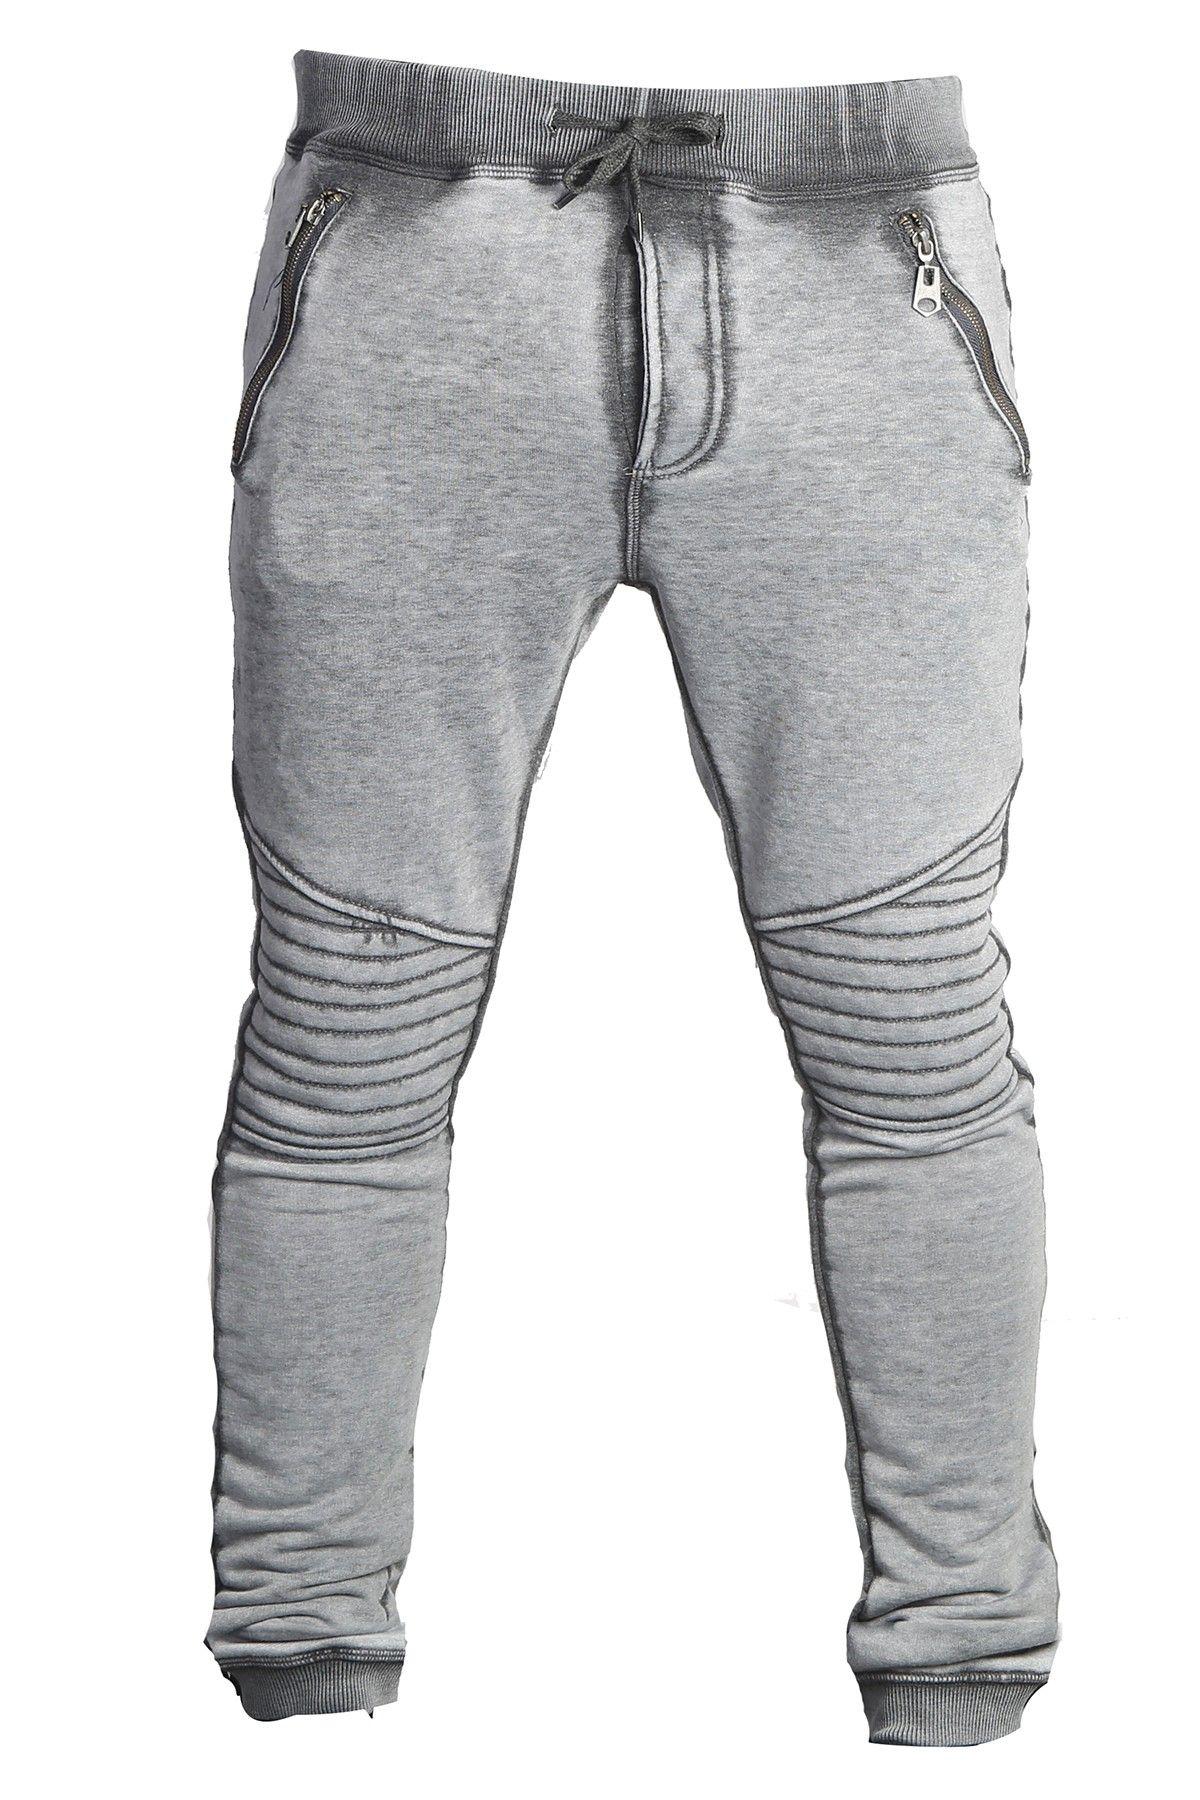 30f2e73a1c Pantalón largo de hombre tela sport corte pantalón de harén Sport chic  Condición  Nuevo Descripción pantalones harén correr jogging pegado al  cuerpo ...